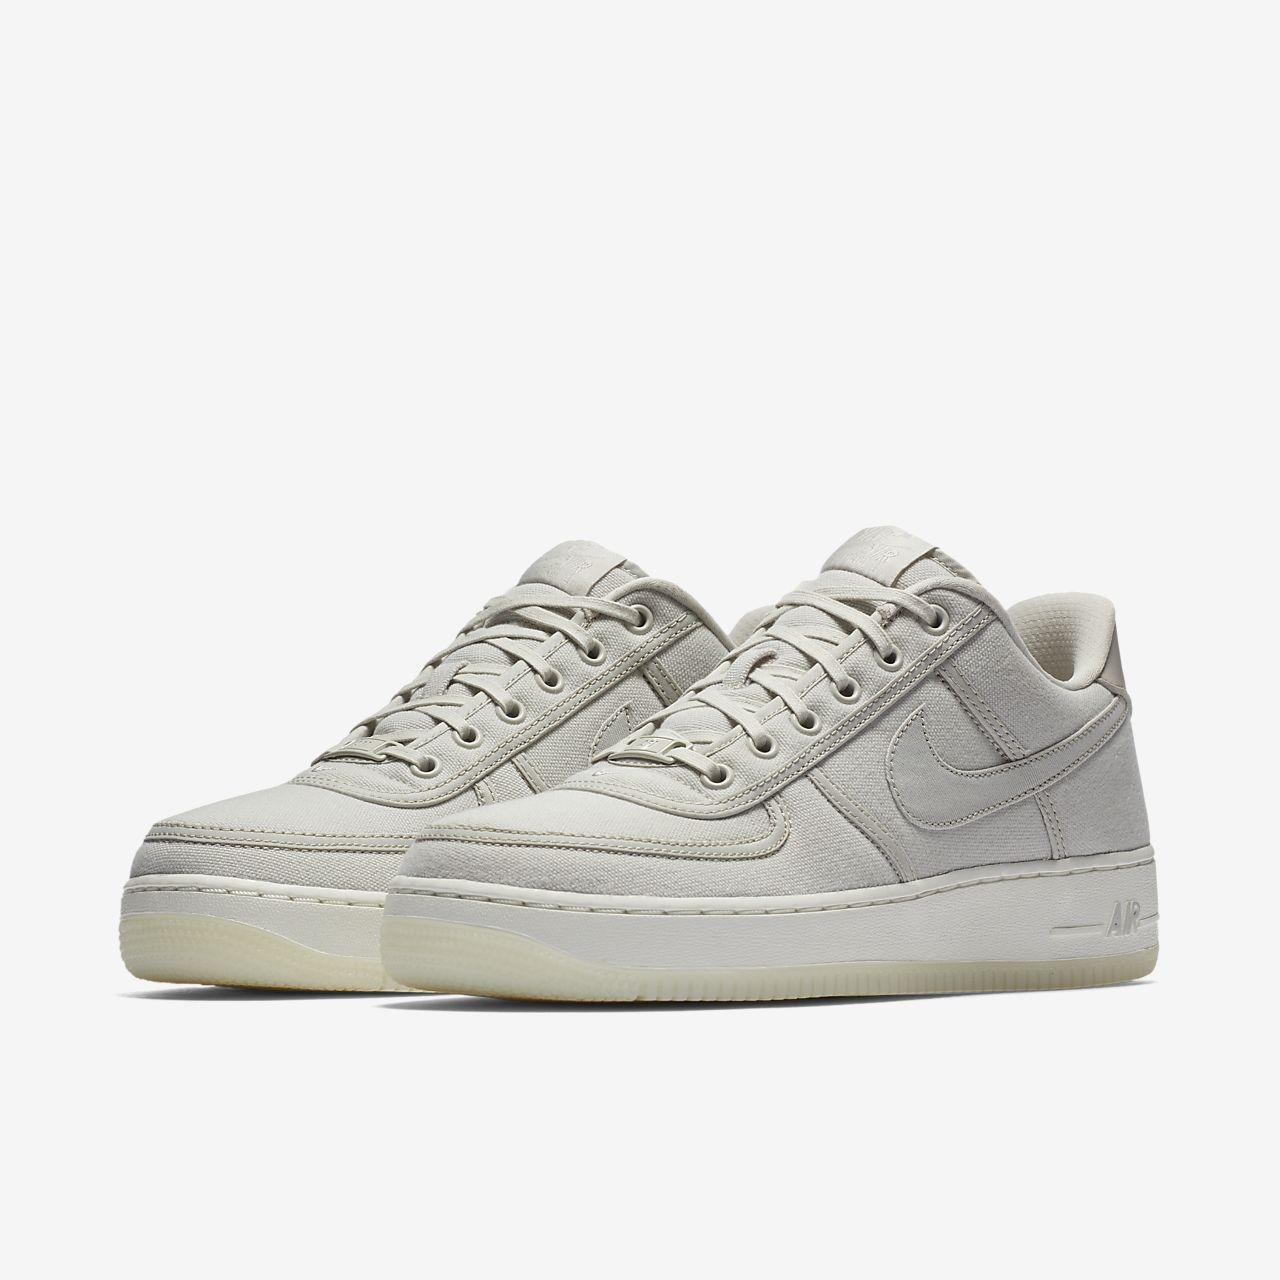 best website c1594 f2cf4 Nike Air Force 1 Low Retro QS Men's Shoe. Nike.com